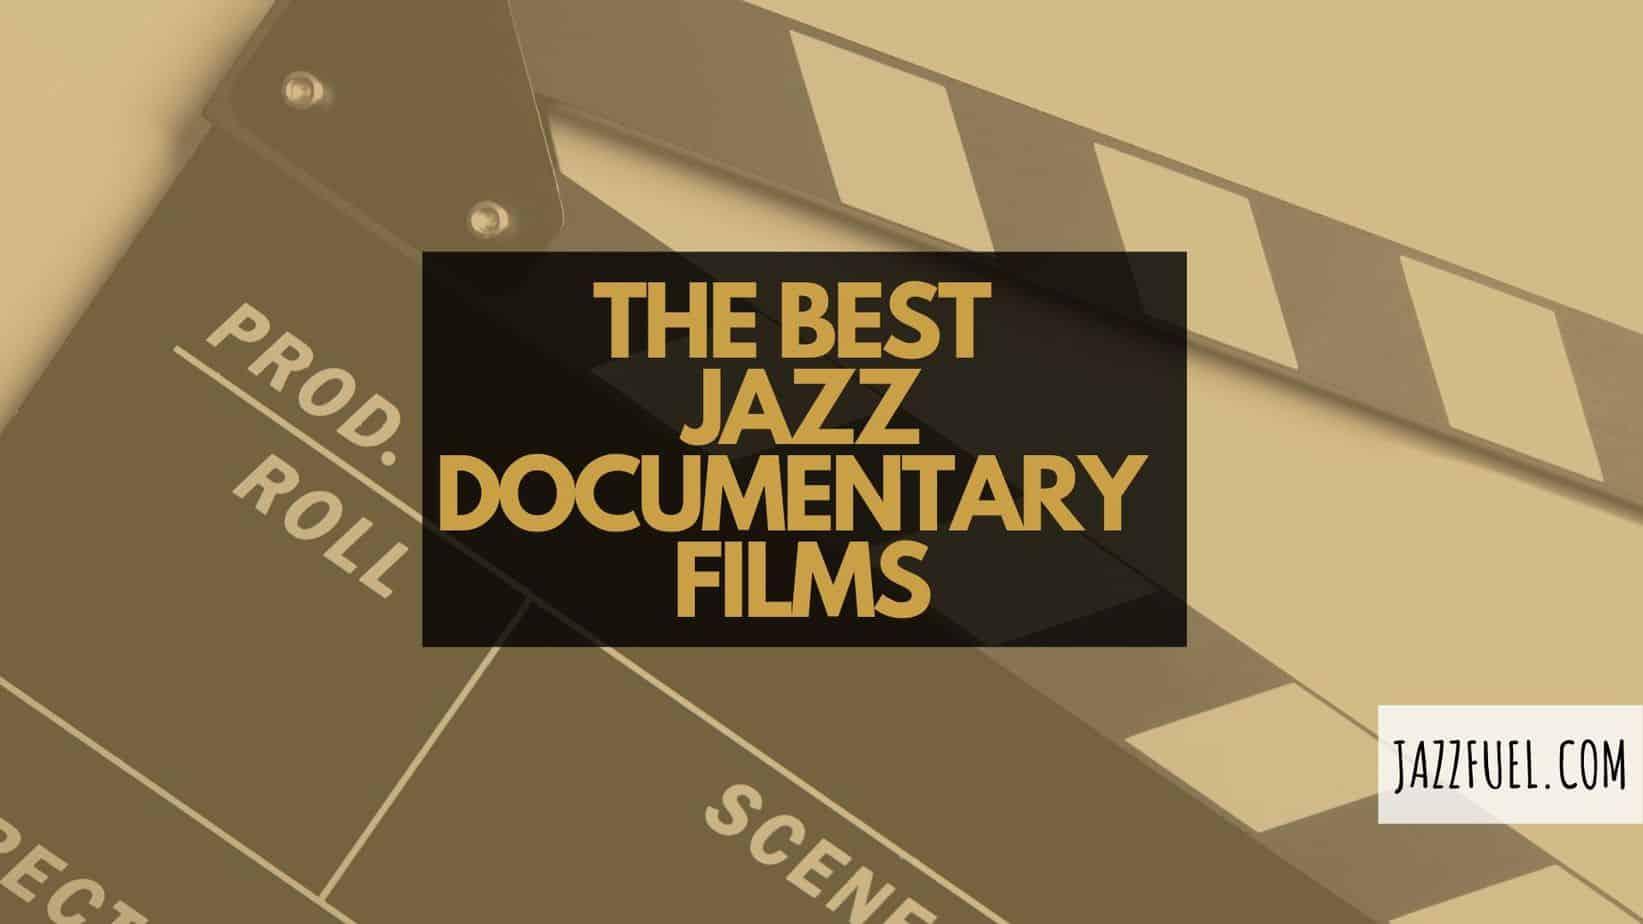 10 of the Best Jazz Documentaries